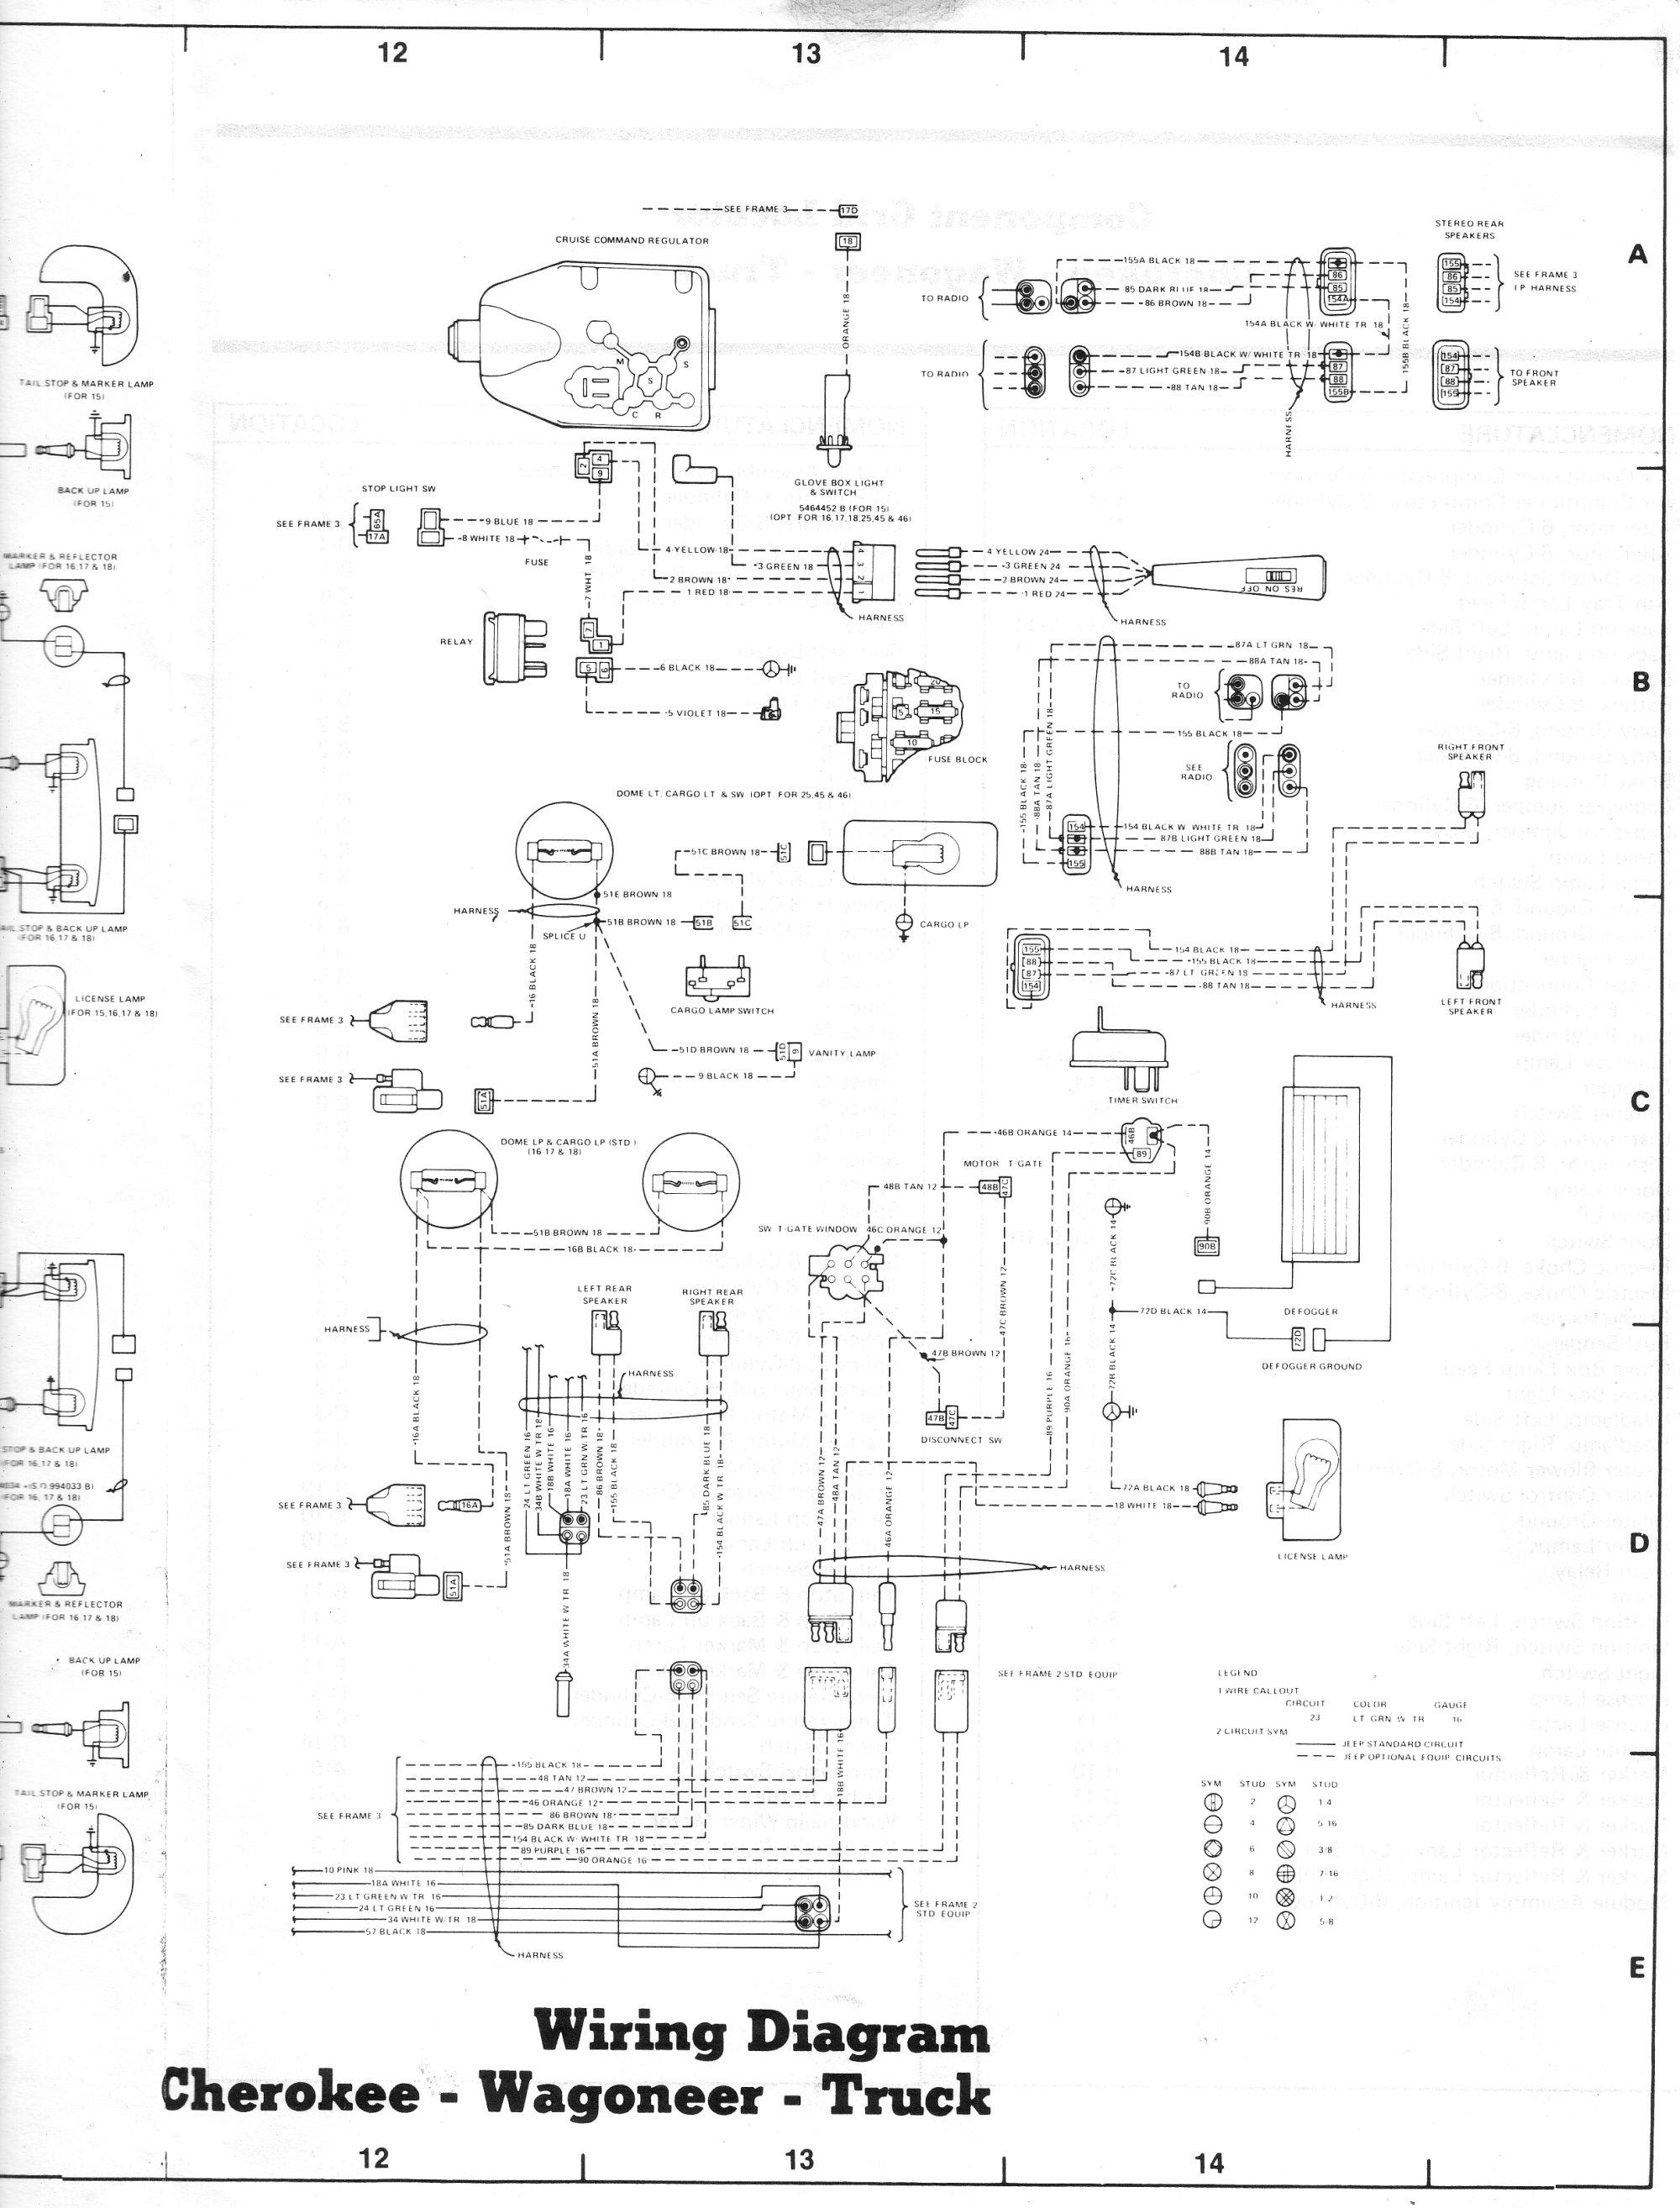 hight resolution of tom oljeep collins fsj wiring page 1985 jeep grand wagoneer wiring 1996 jeep cherokee wiring diagram